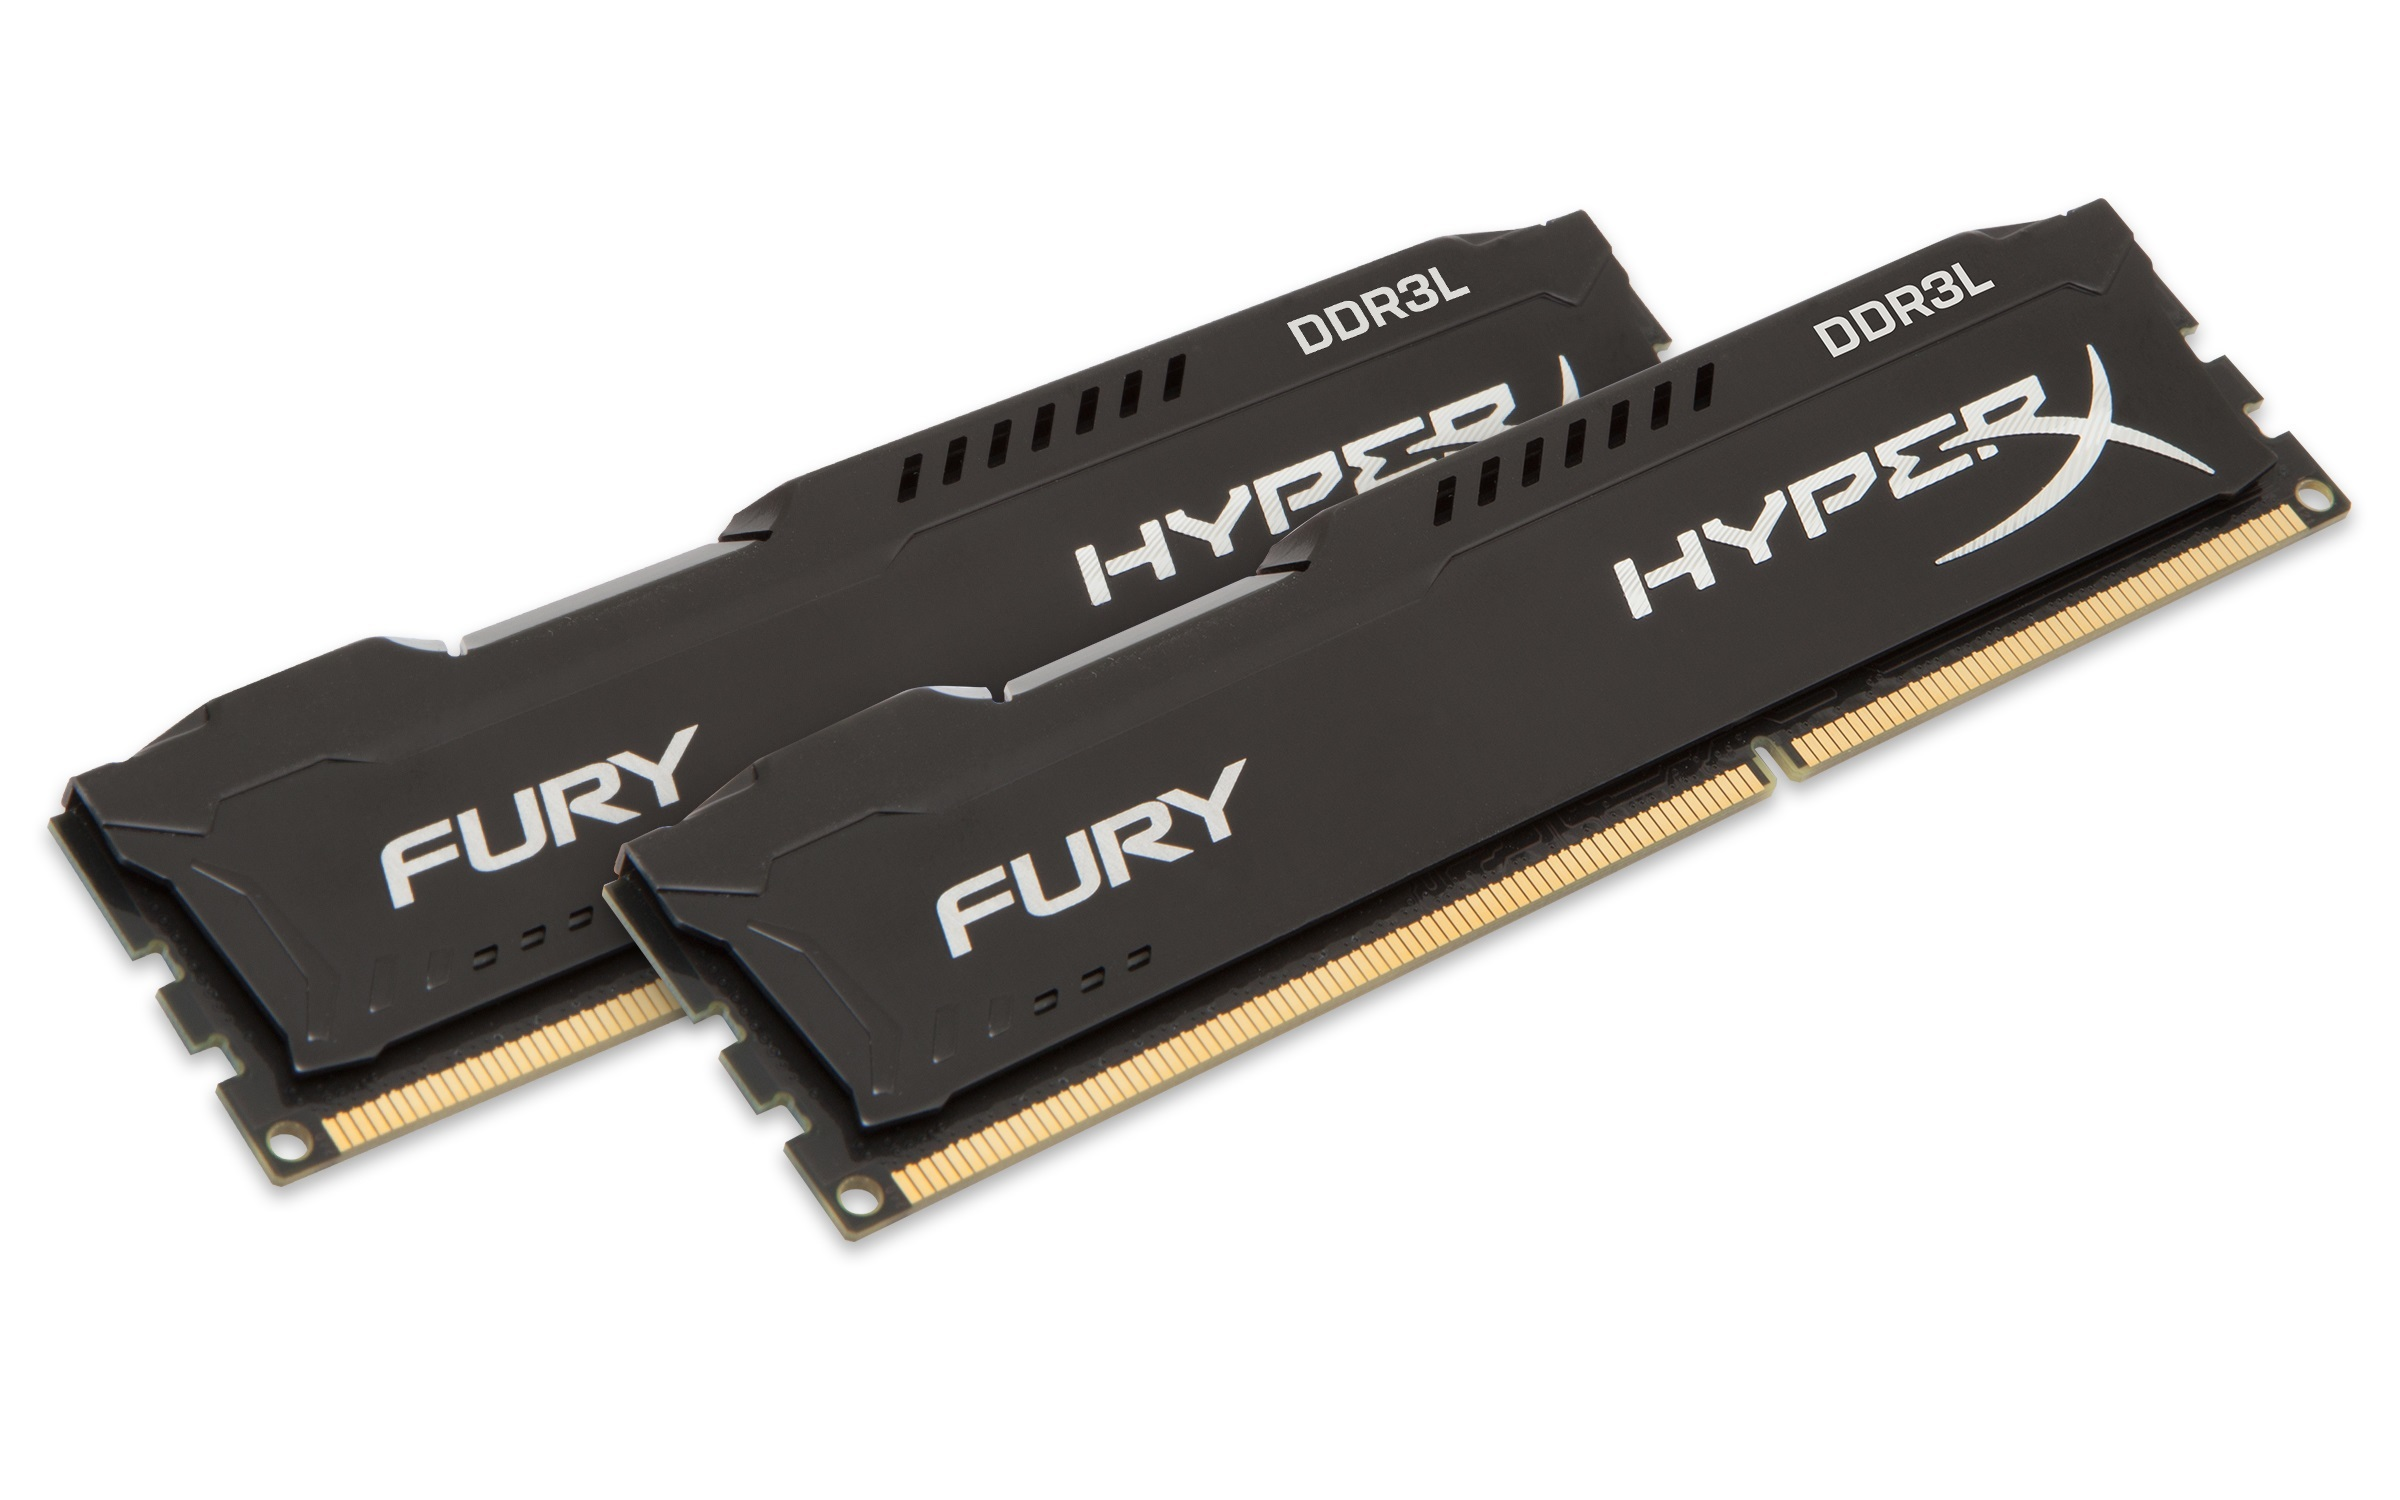 16GB DDR3L-1600MHz Kingston HyperX Fury Bl., 2x8GB